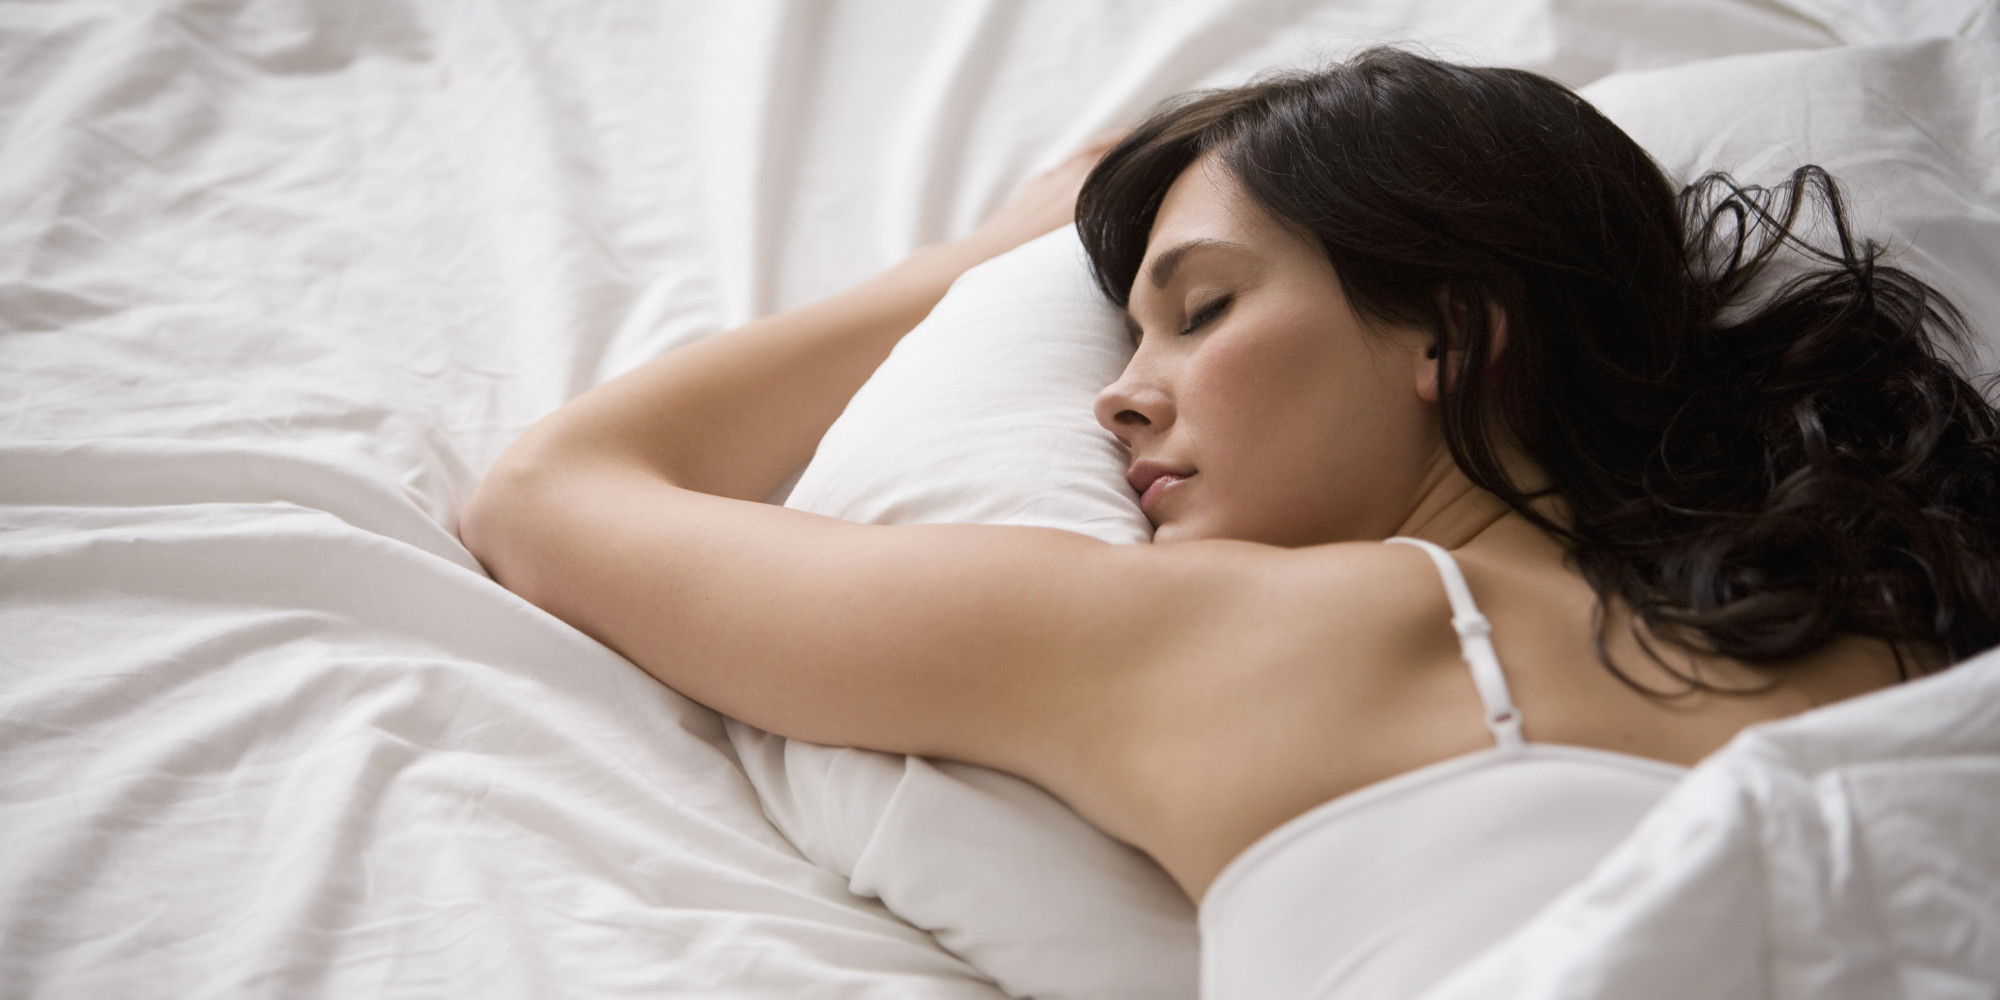 How to Get a Good Night's Sleep With Crohn's Disease